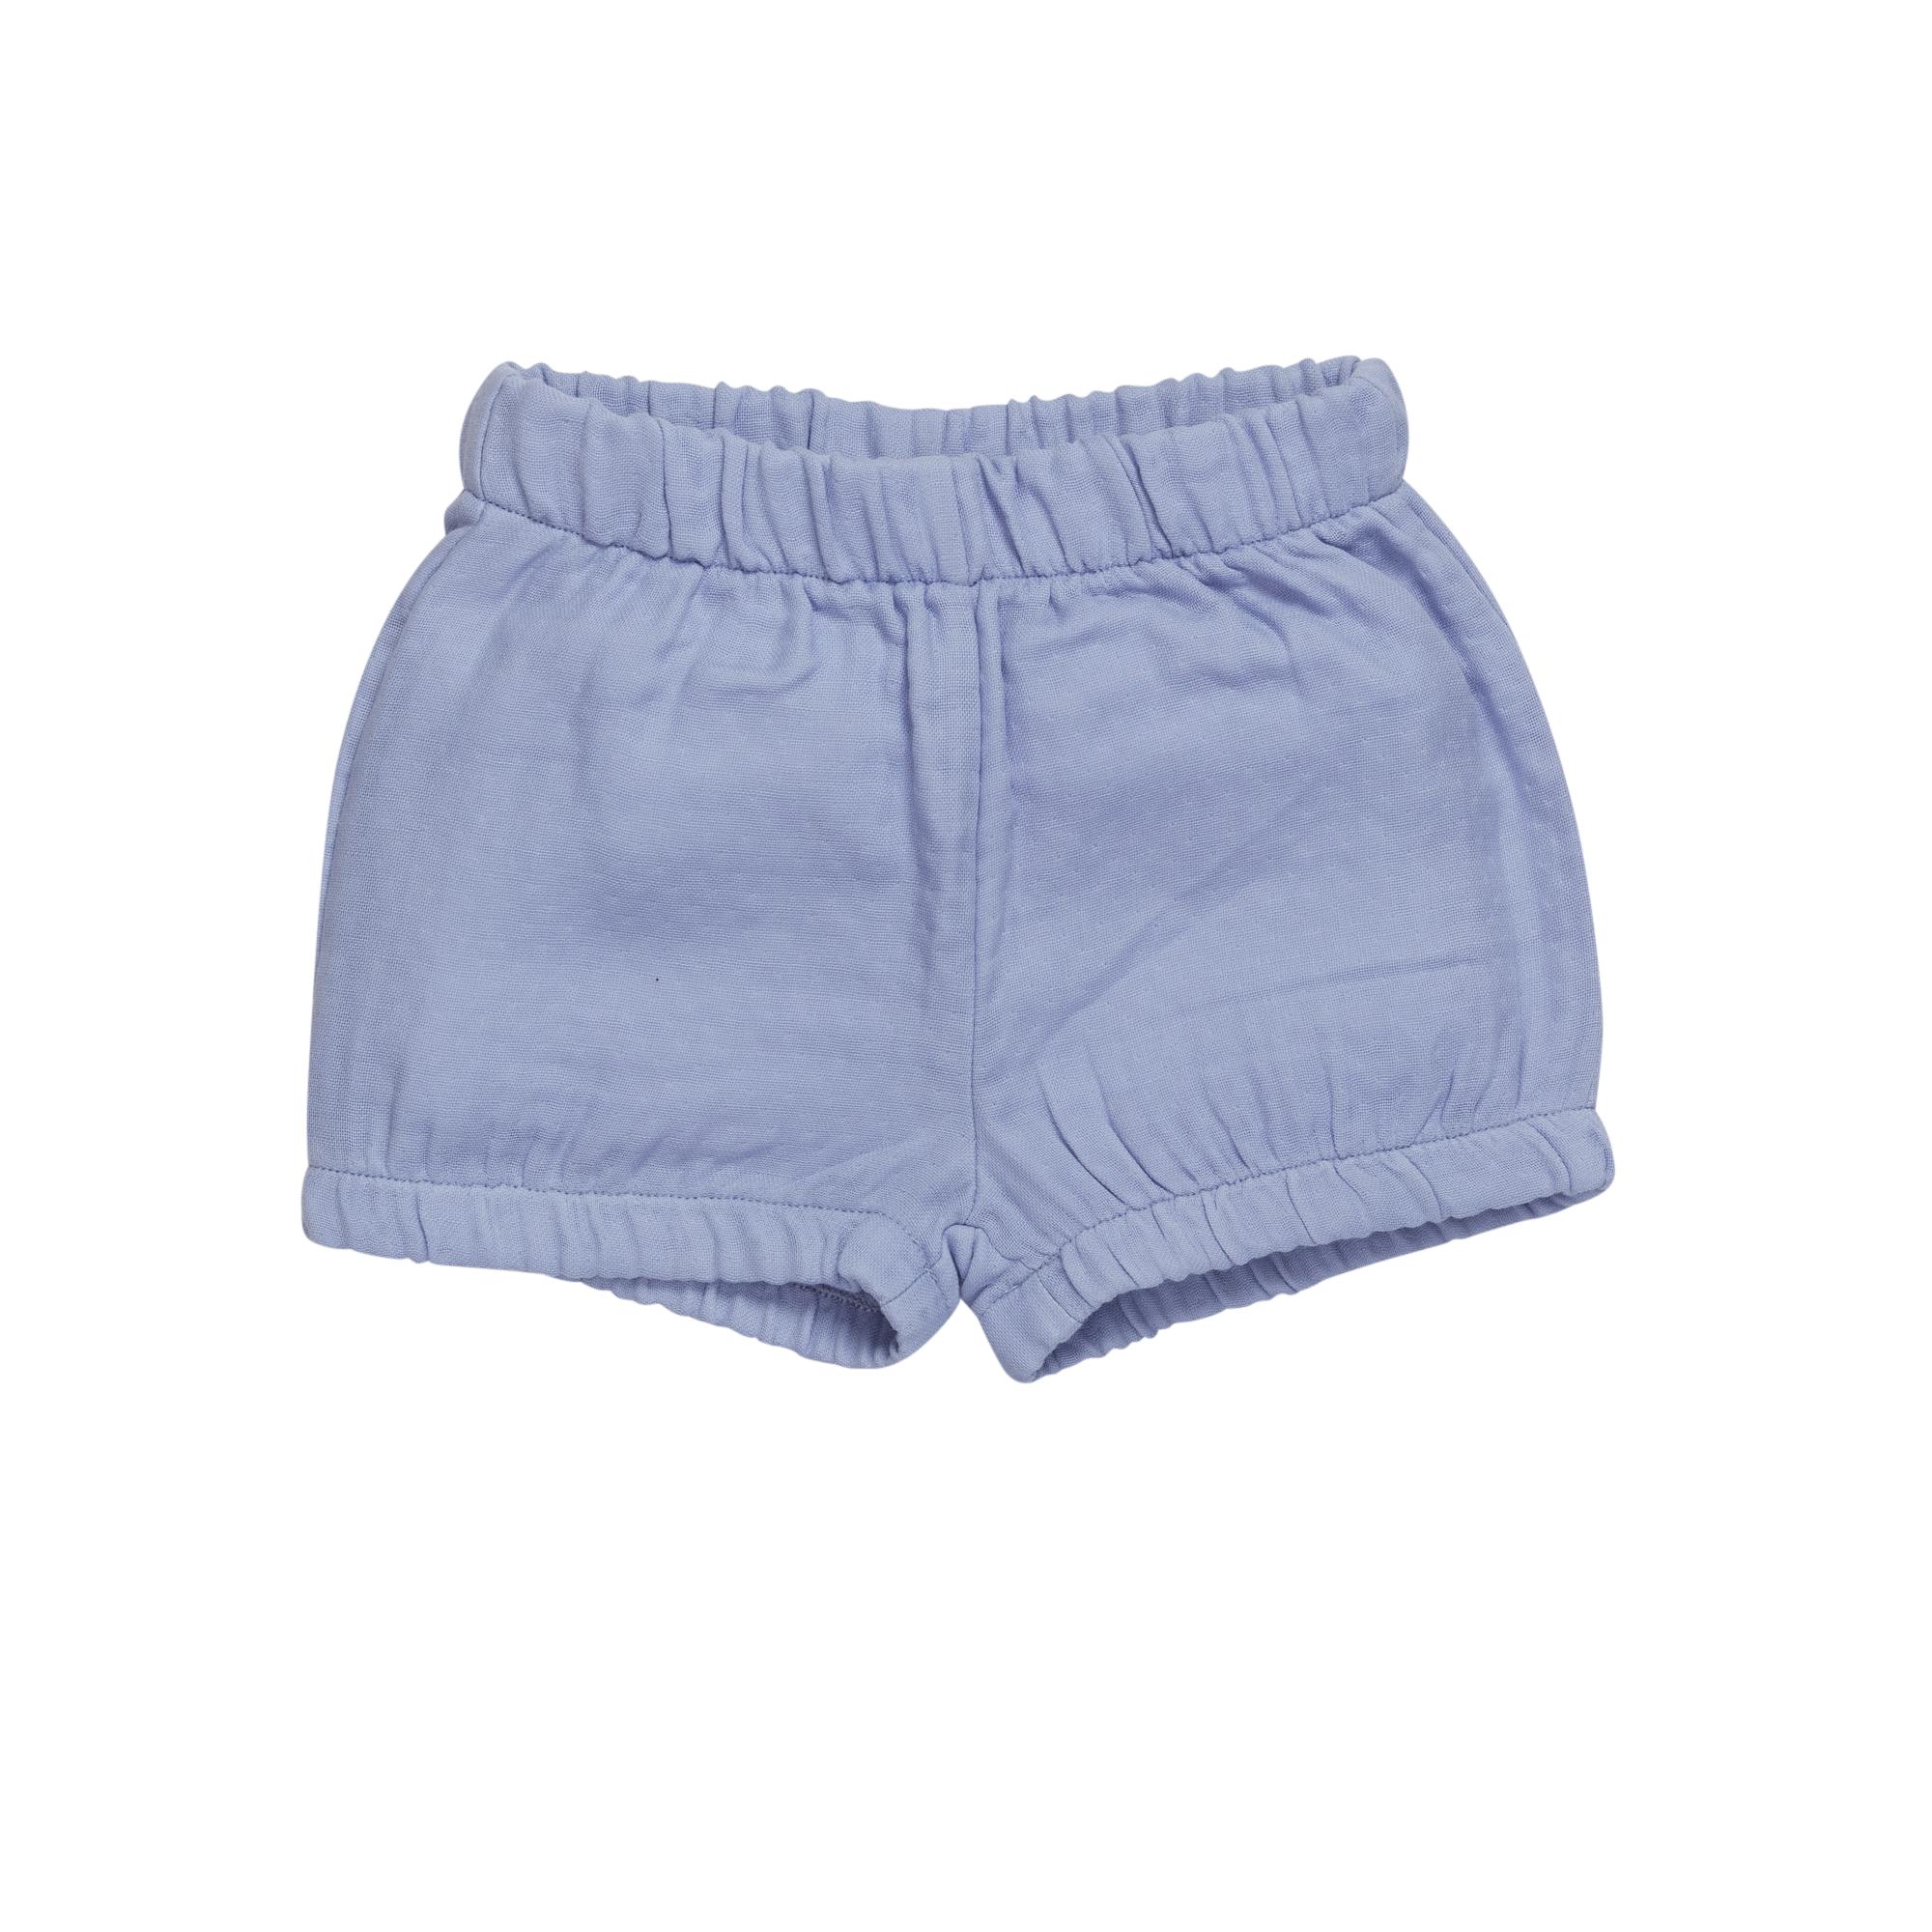 Shorts muslin - Lilac Blue-1